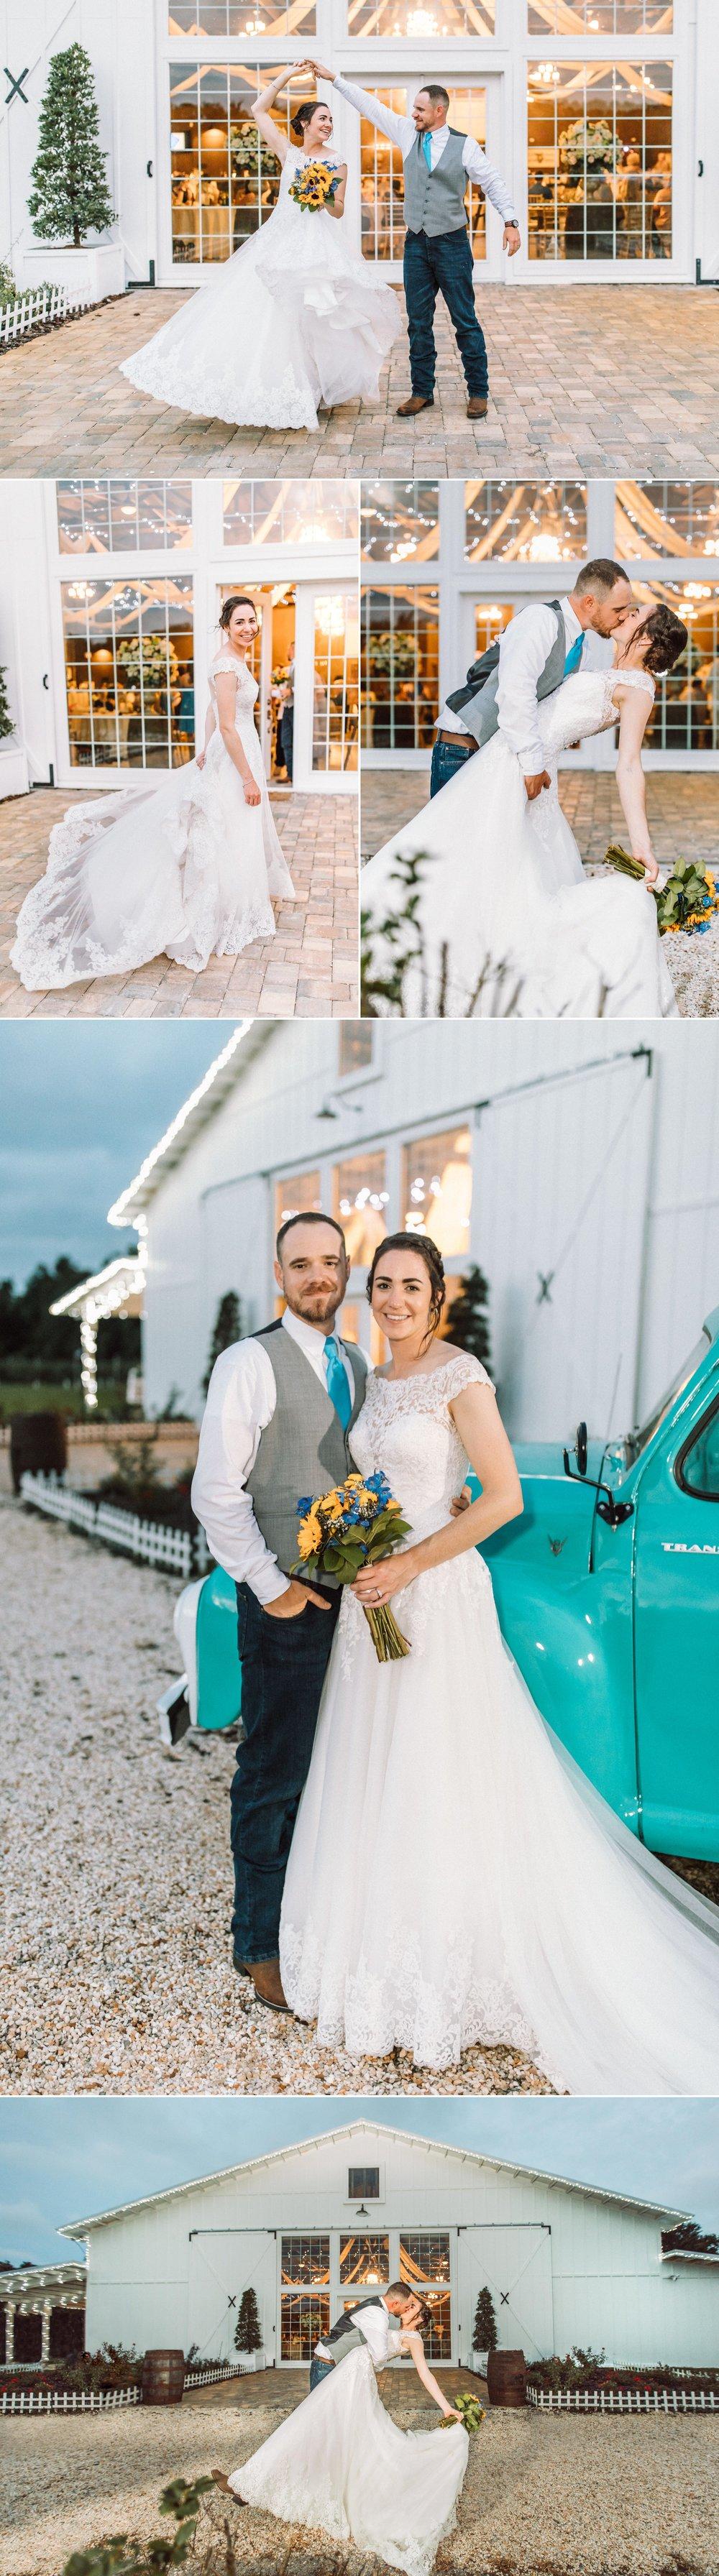 Rustic Sunflower & Blueberry Barn Wedding- Ever After Farms - Allie & NickBlog 23.jpg